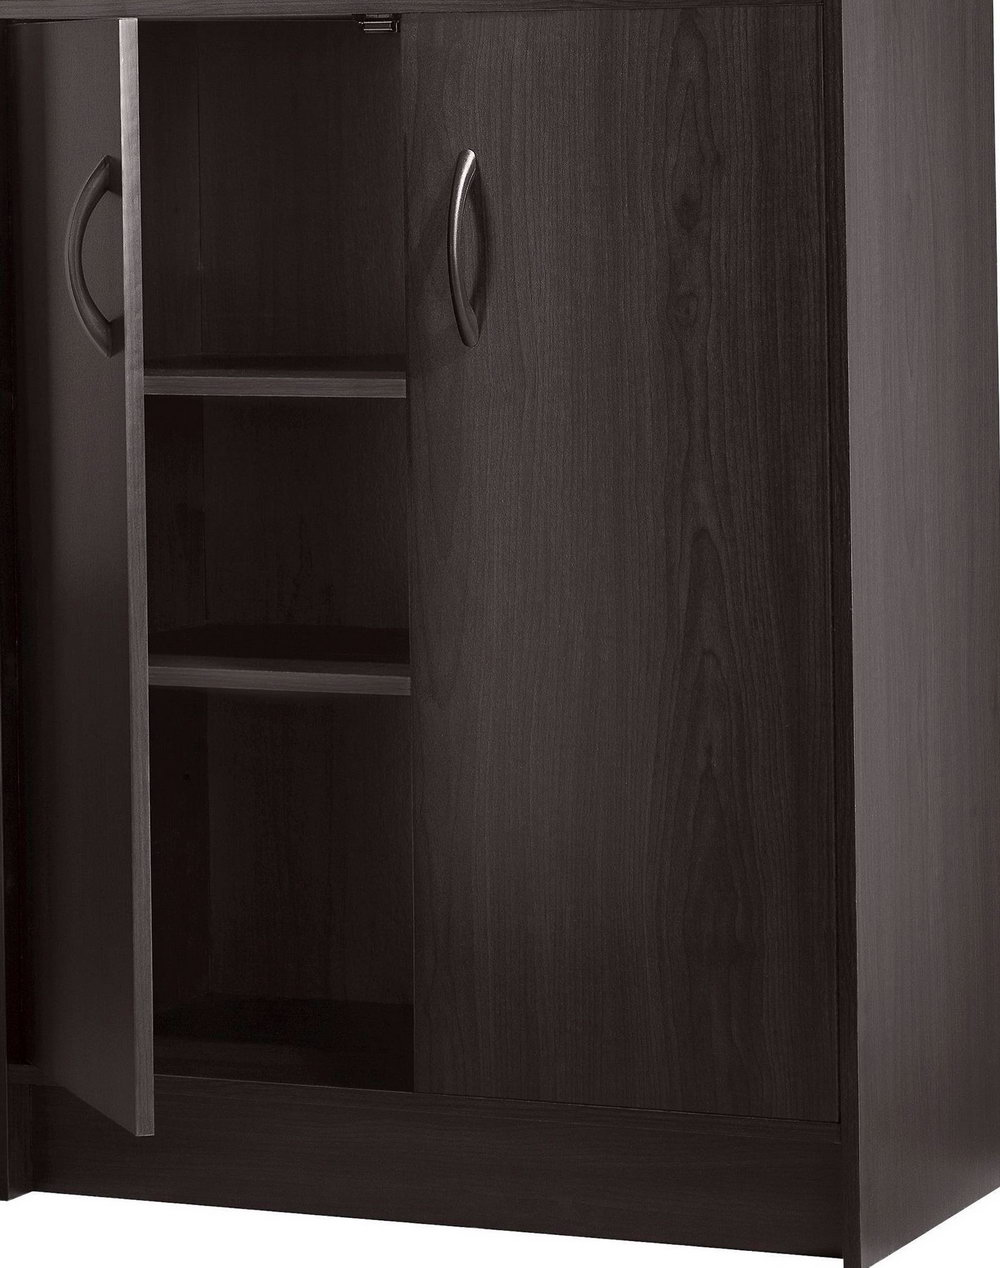 Utility Storage Cabinets 2 Door Organizer Espresso